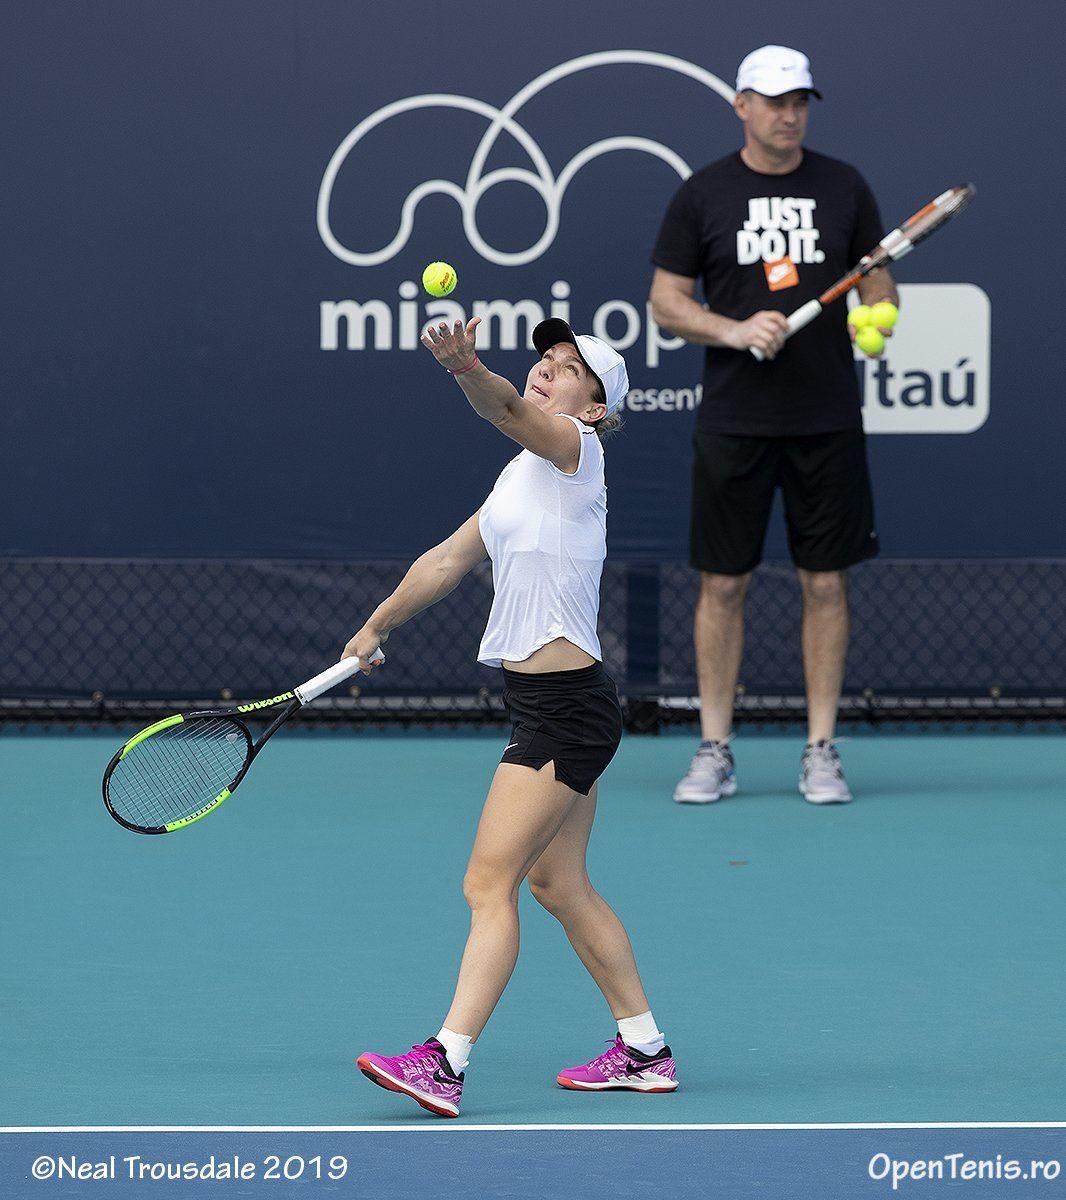 Simona Halep practicing in miami open 2019, tennis drills